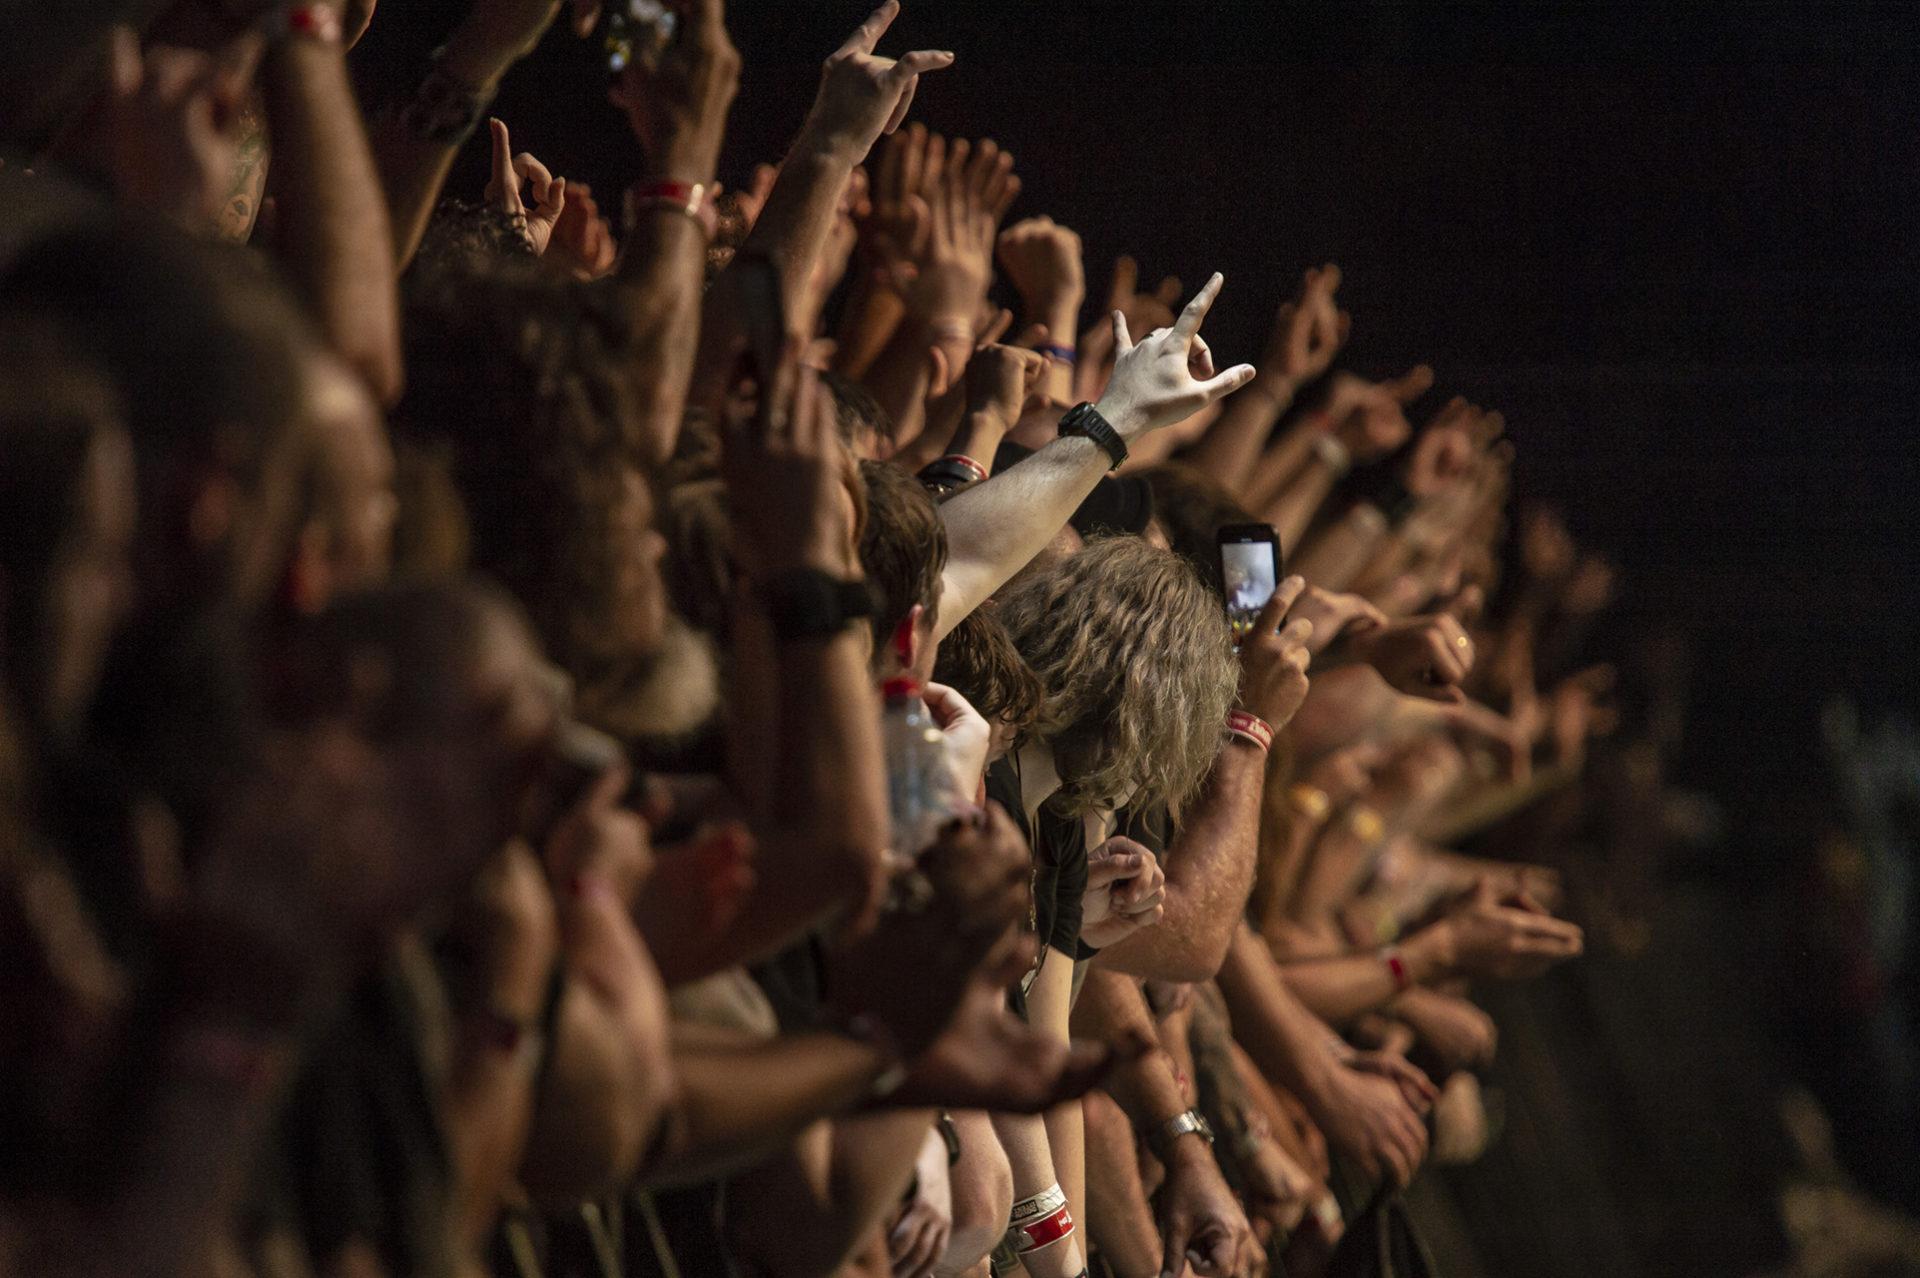 Crowd_12